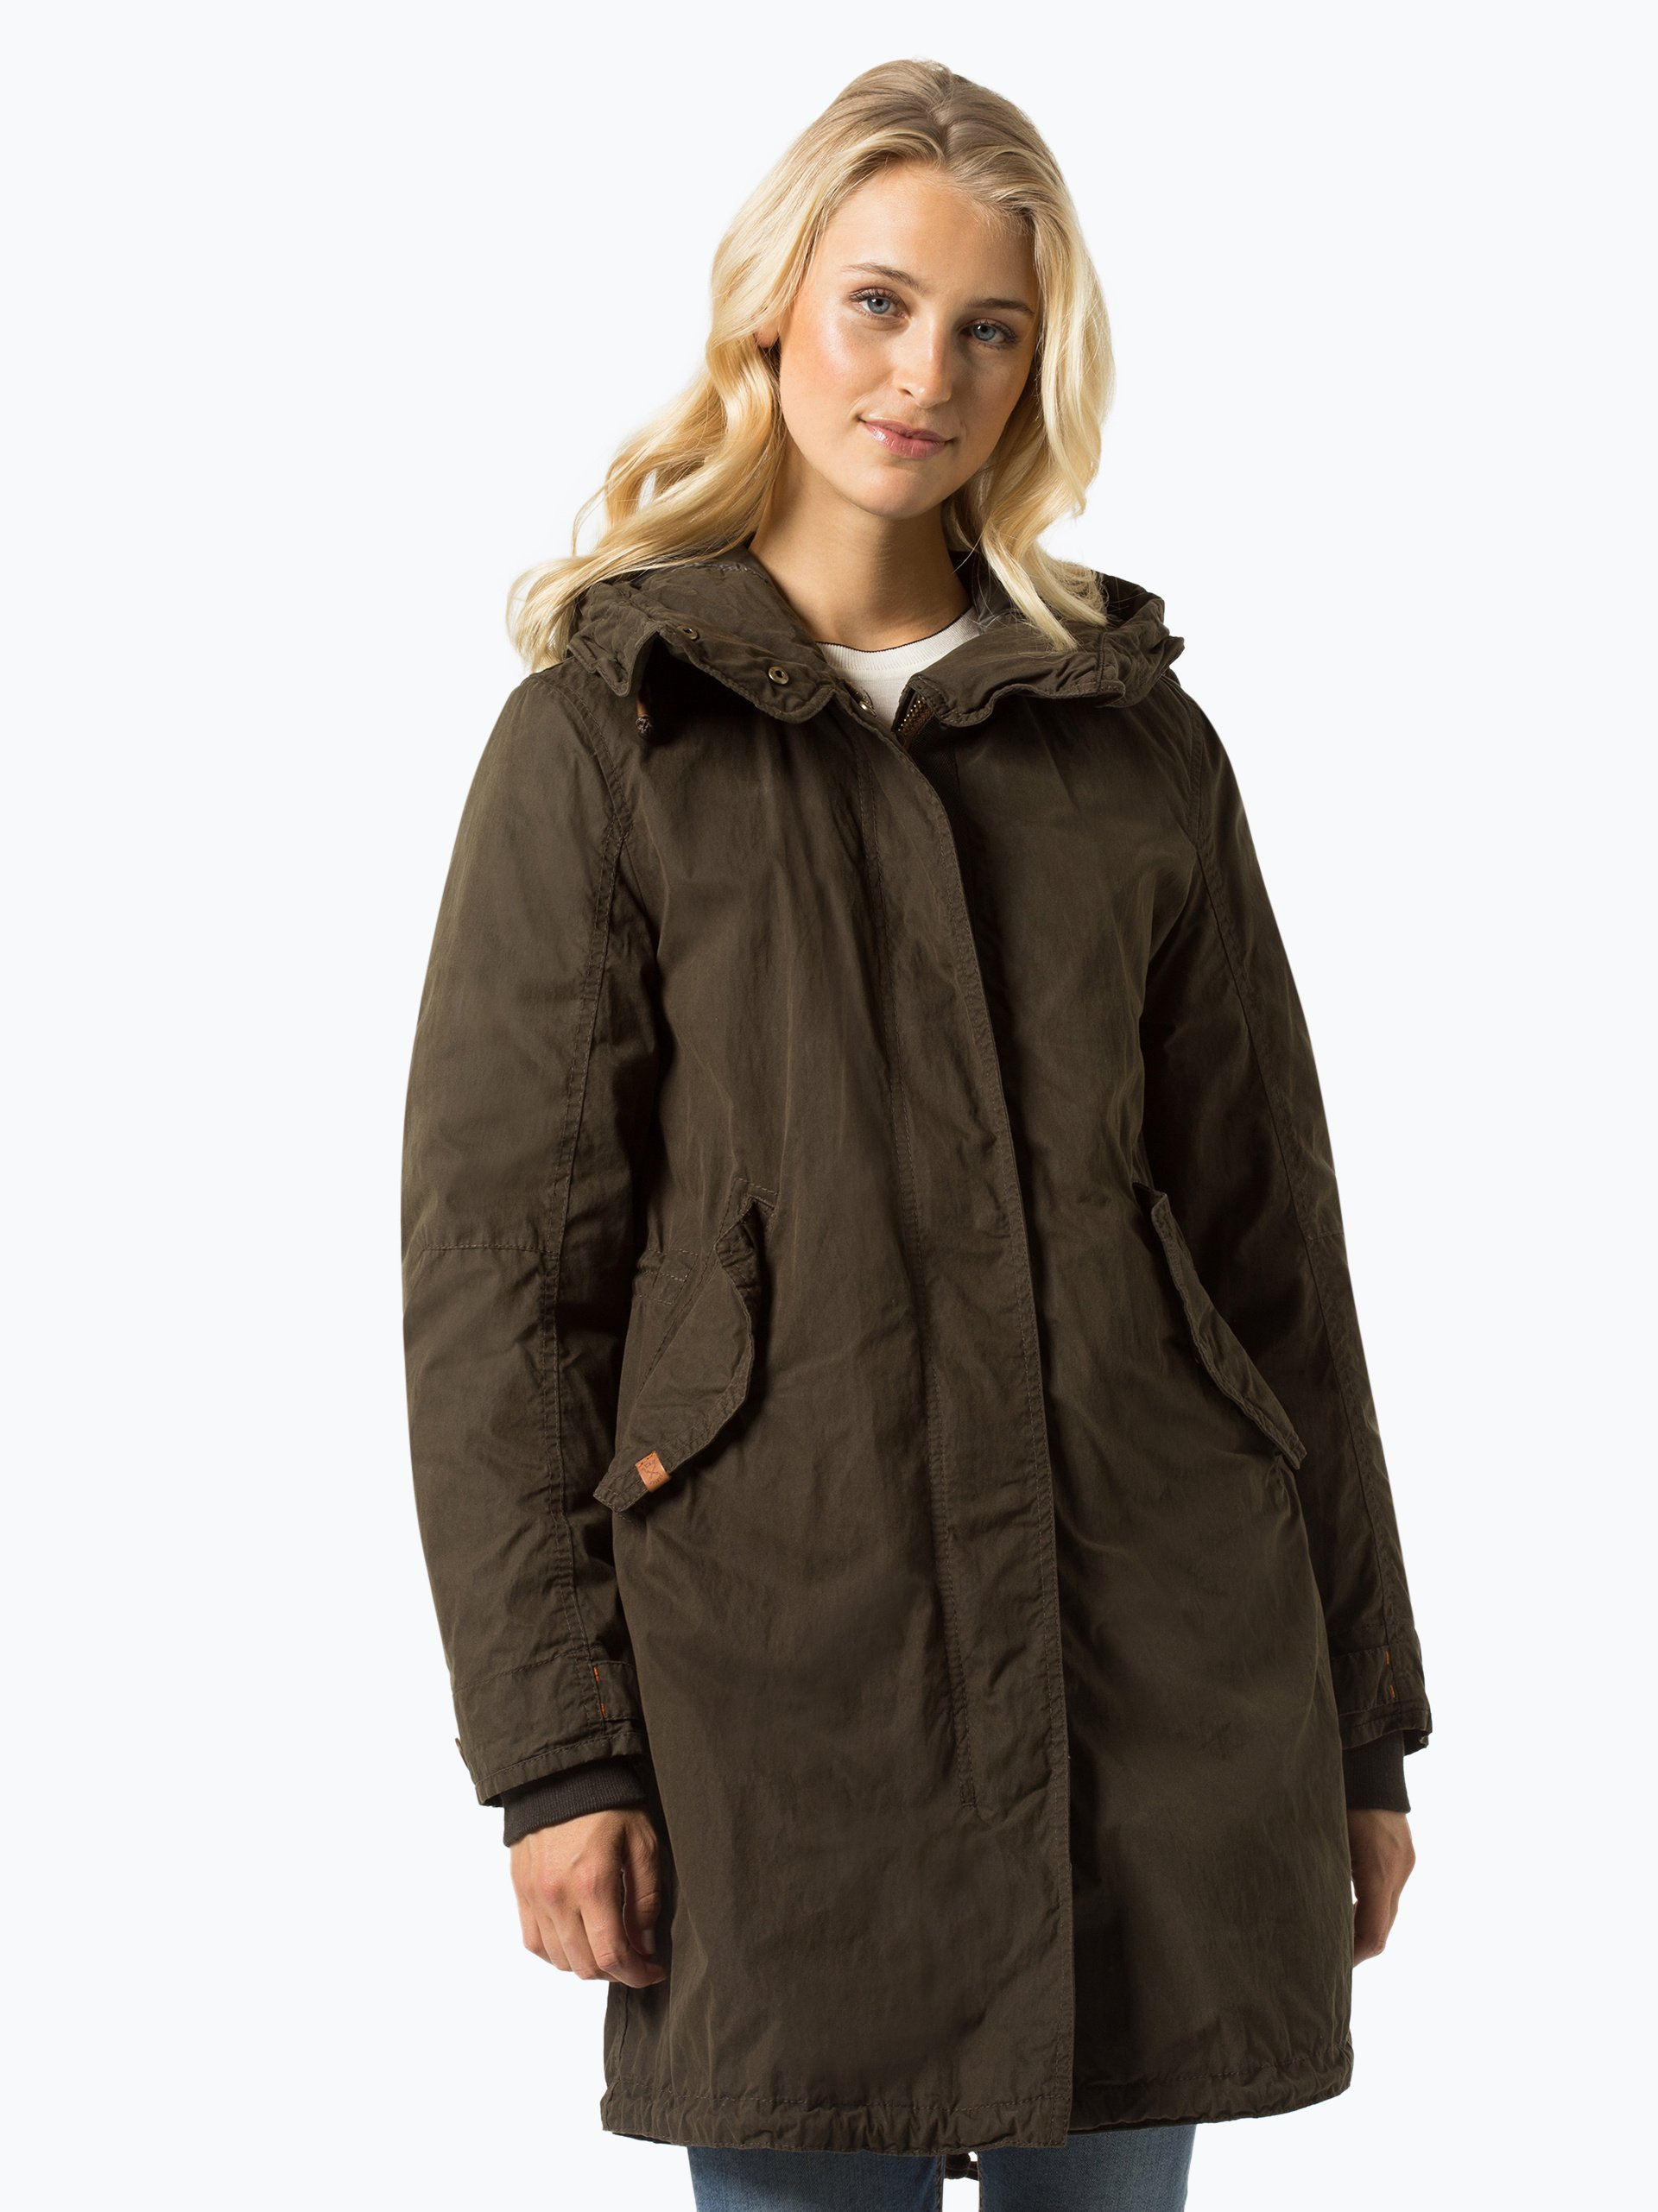 camel active damen mantel oliv uni online kaufen peek und cloppenburg de. Black Bedroom Furniture Sets. Home Design Ideas